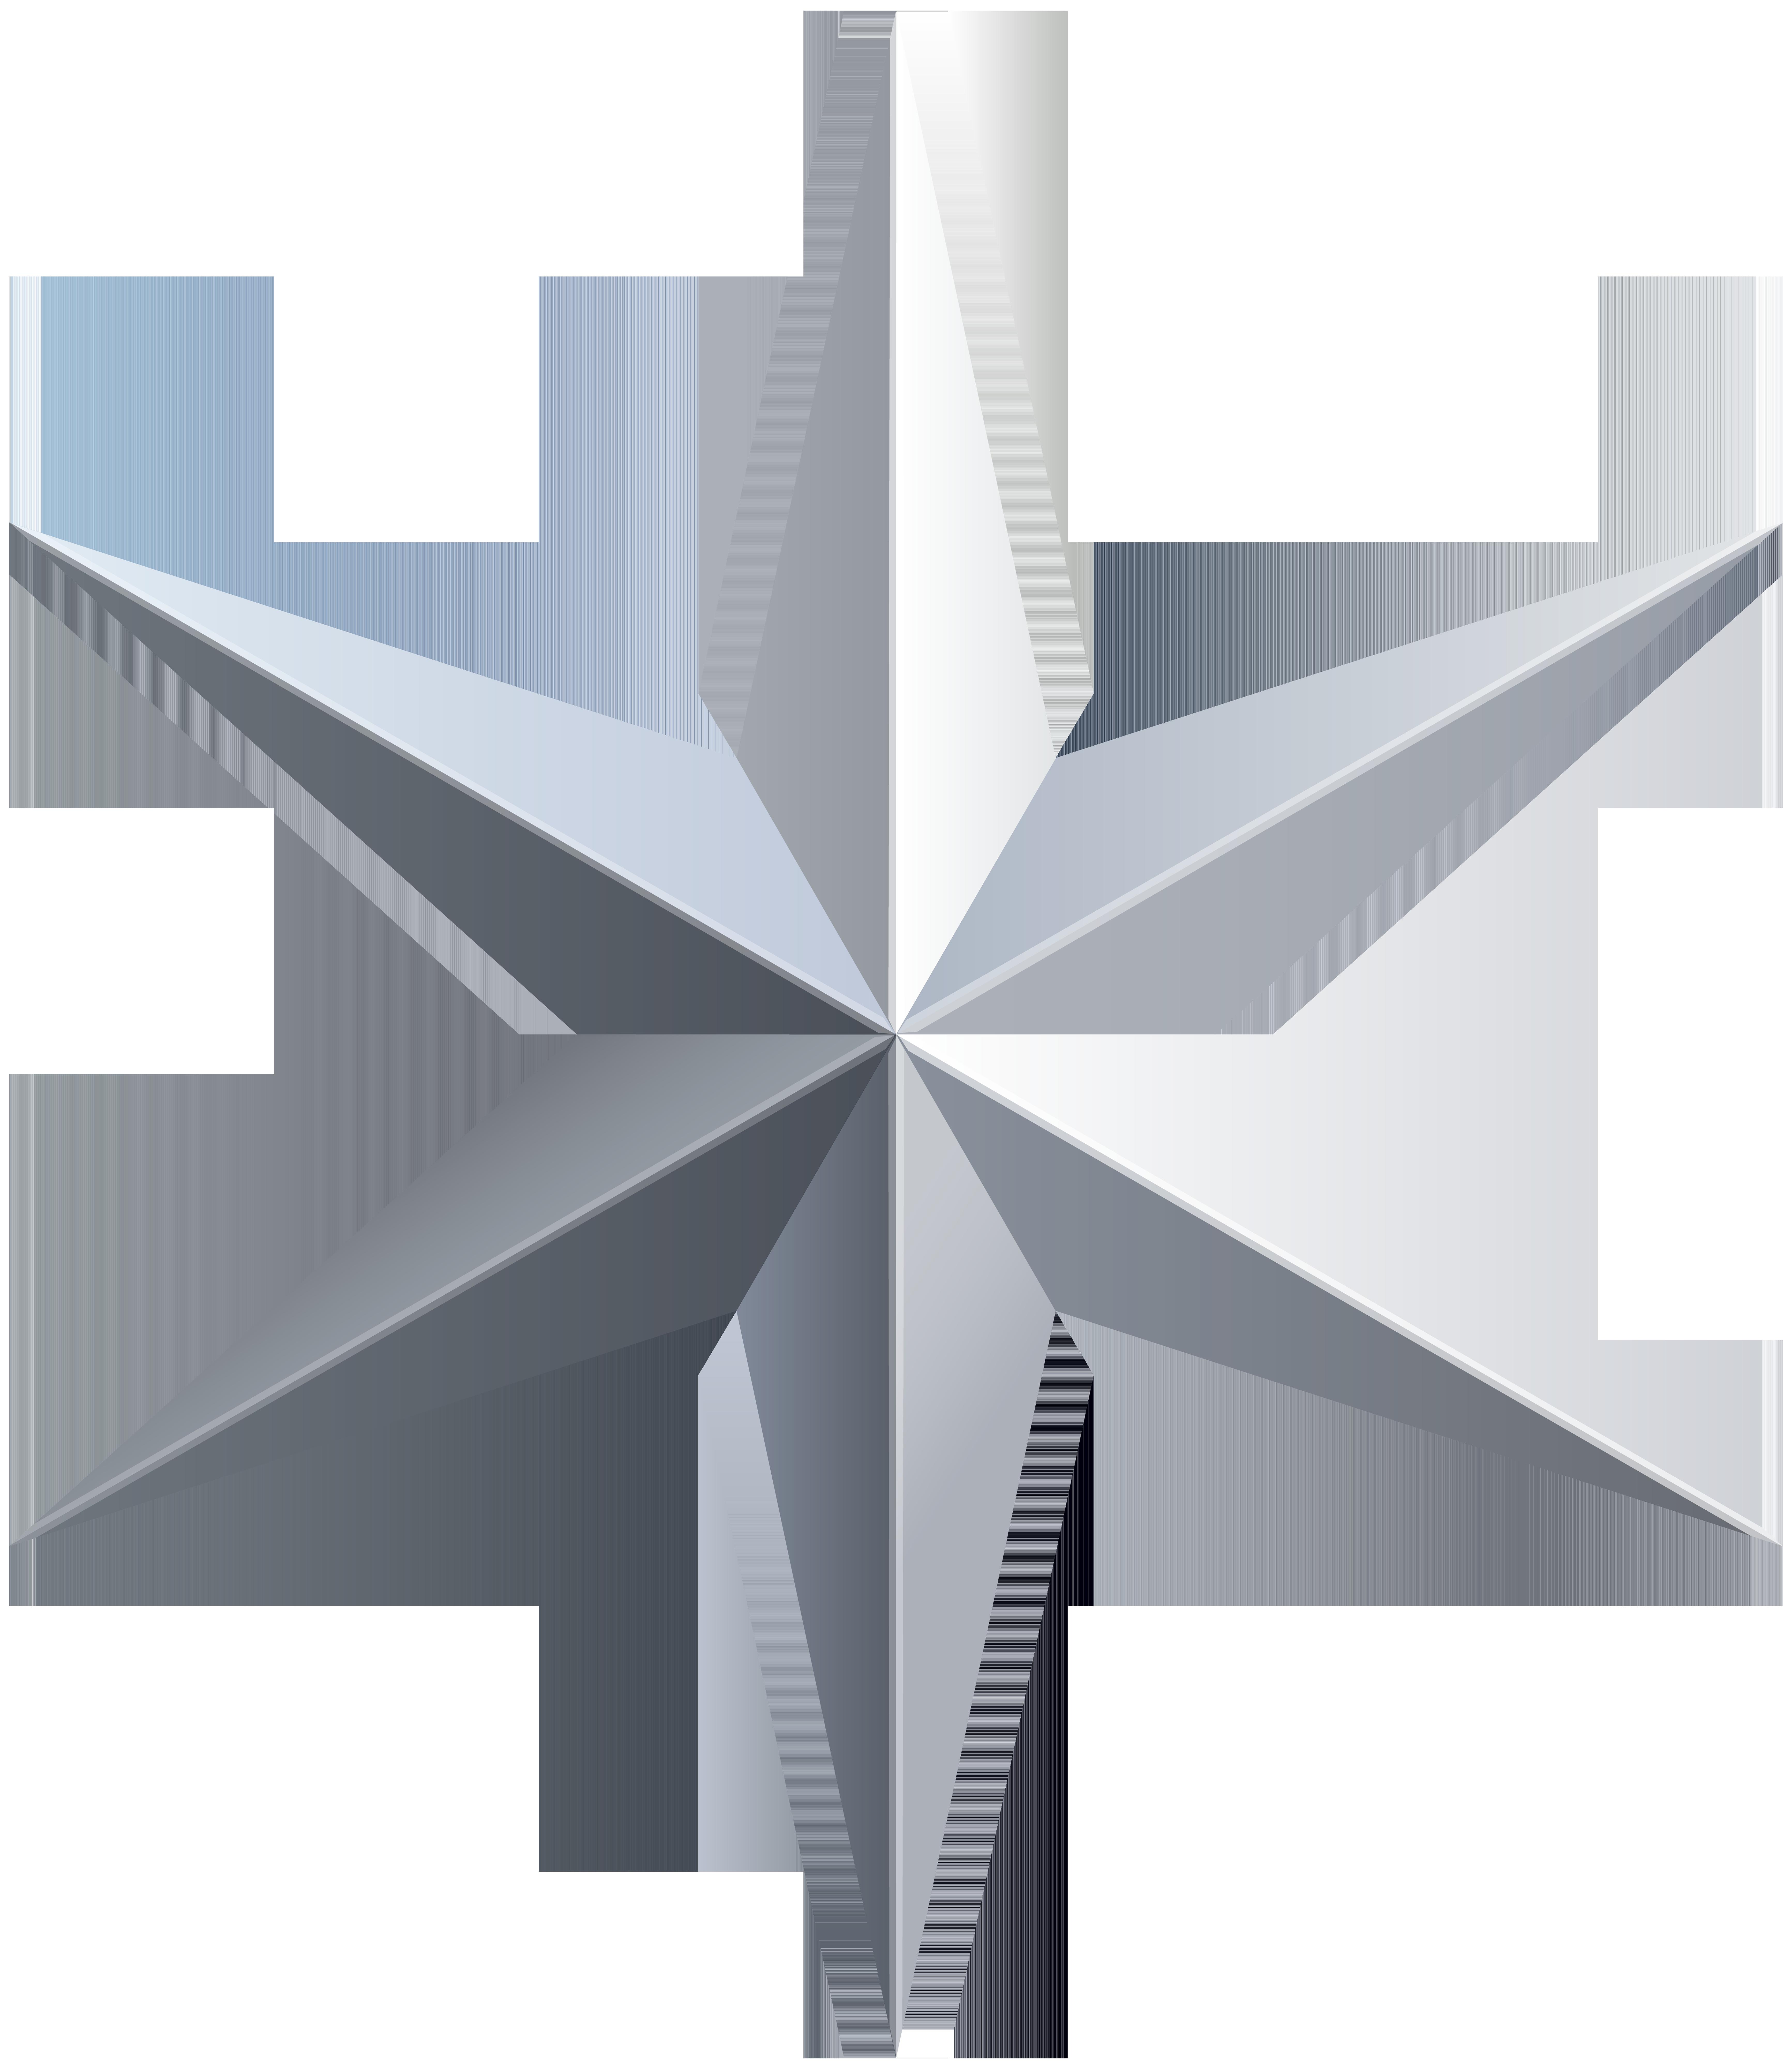 Free Silver Star Cliparts, Download Free Clip Art, Free Clip.